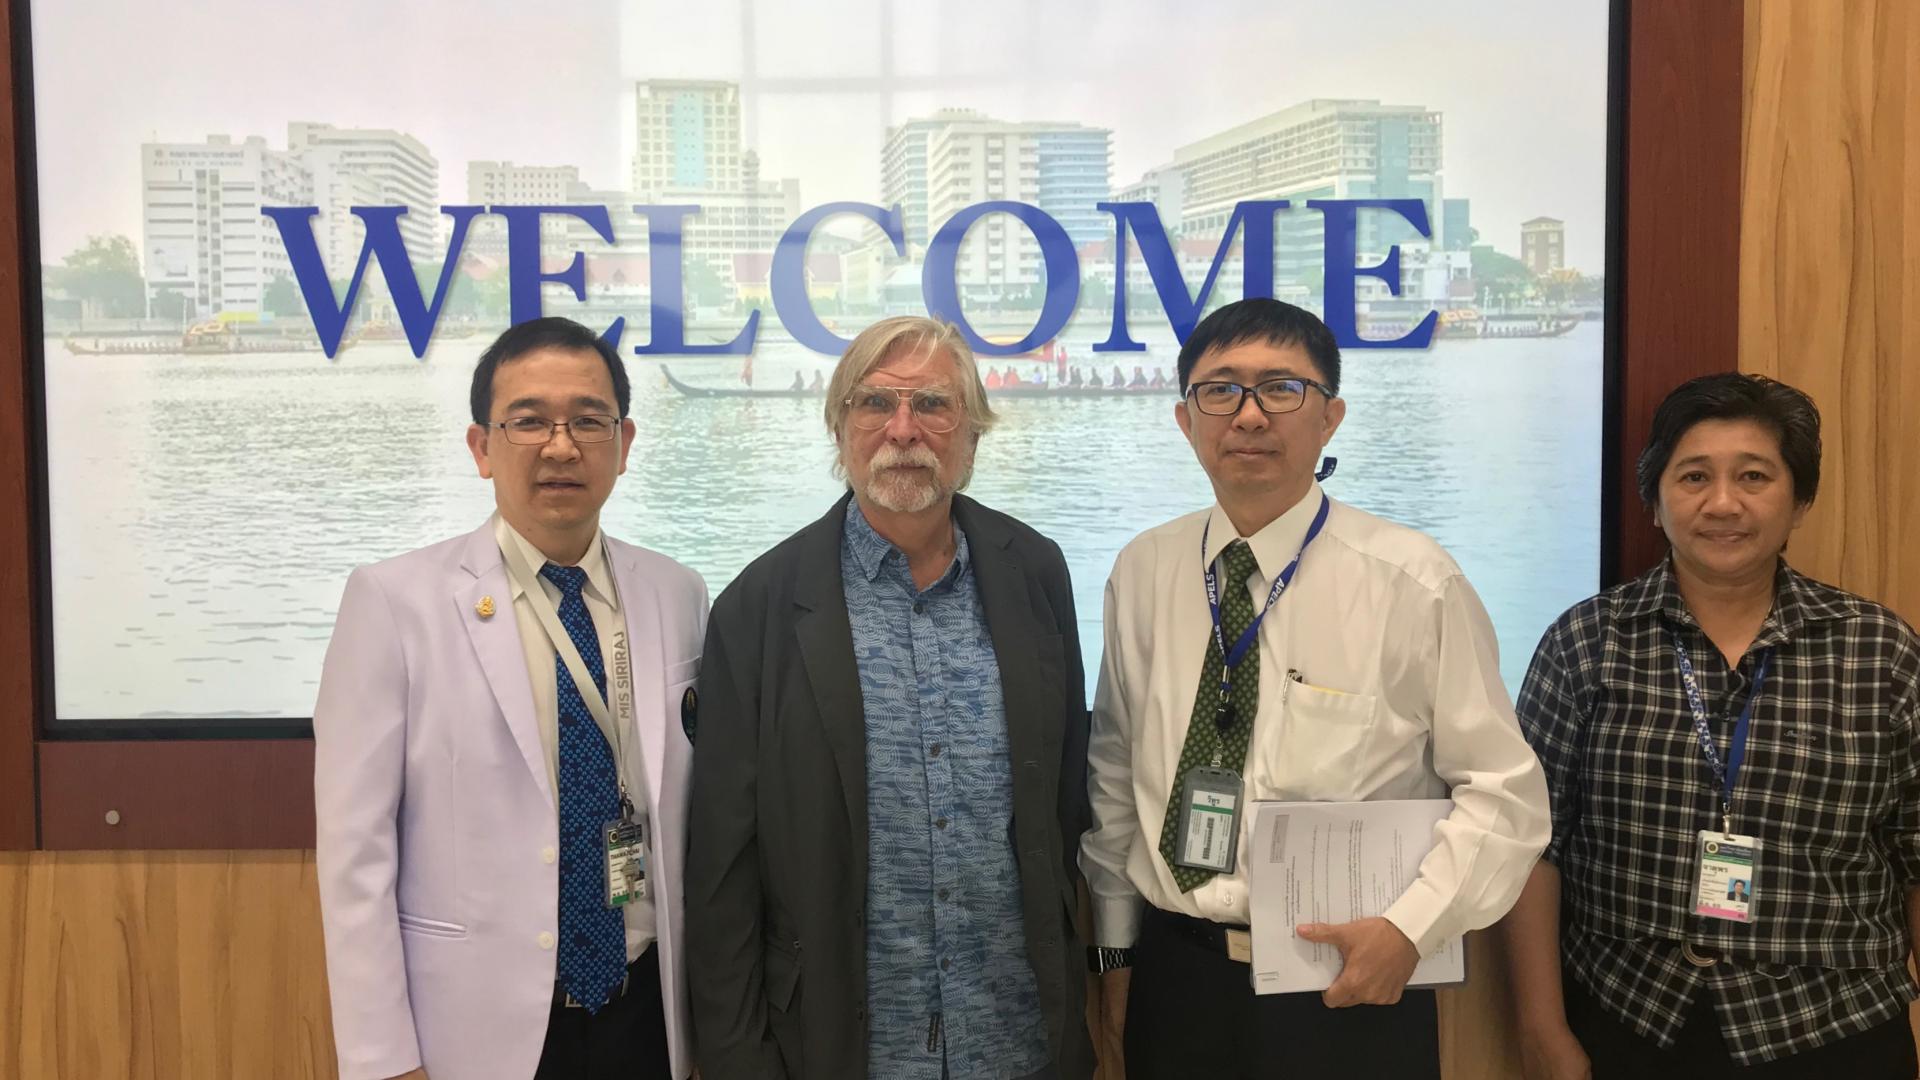 Director of Office of Global Health and International Medicine, John A. Burn School of Medicine, Hawaii Visits Siriraj